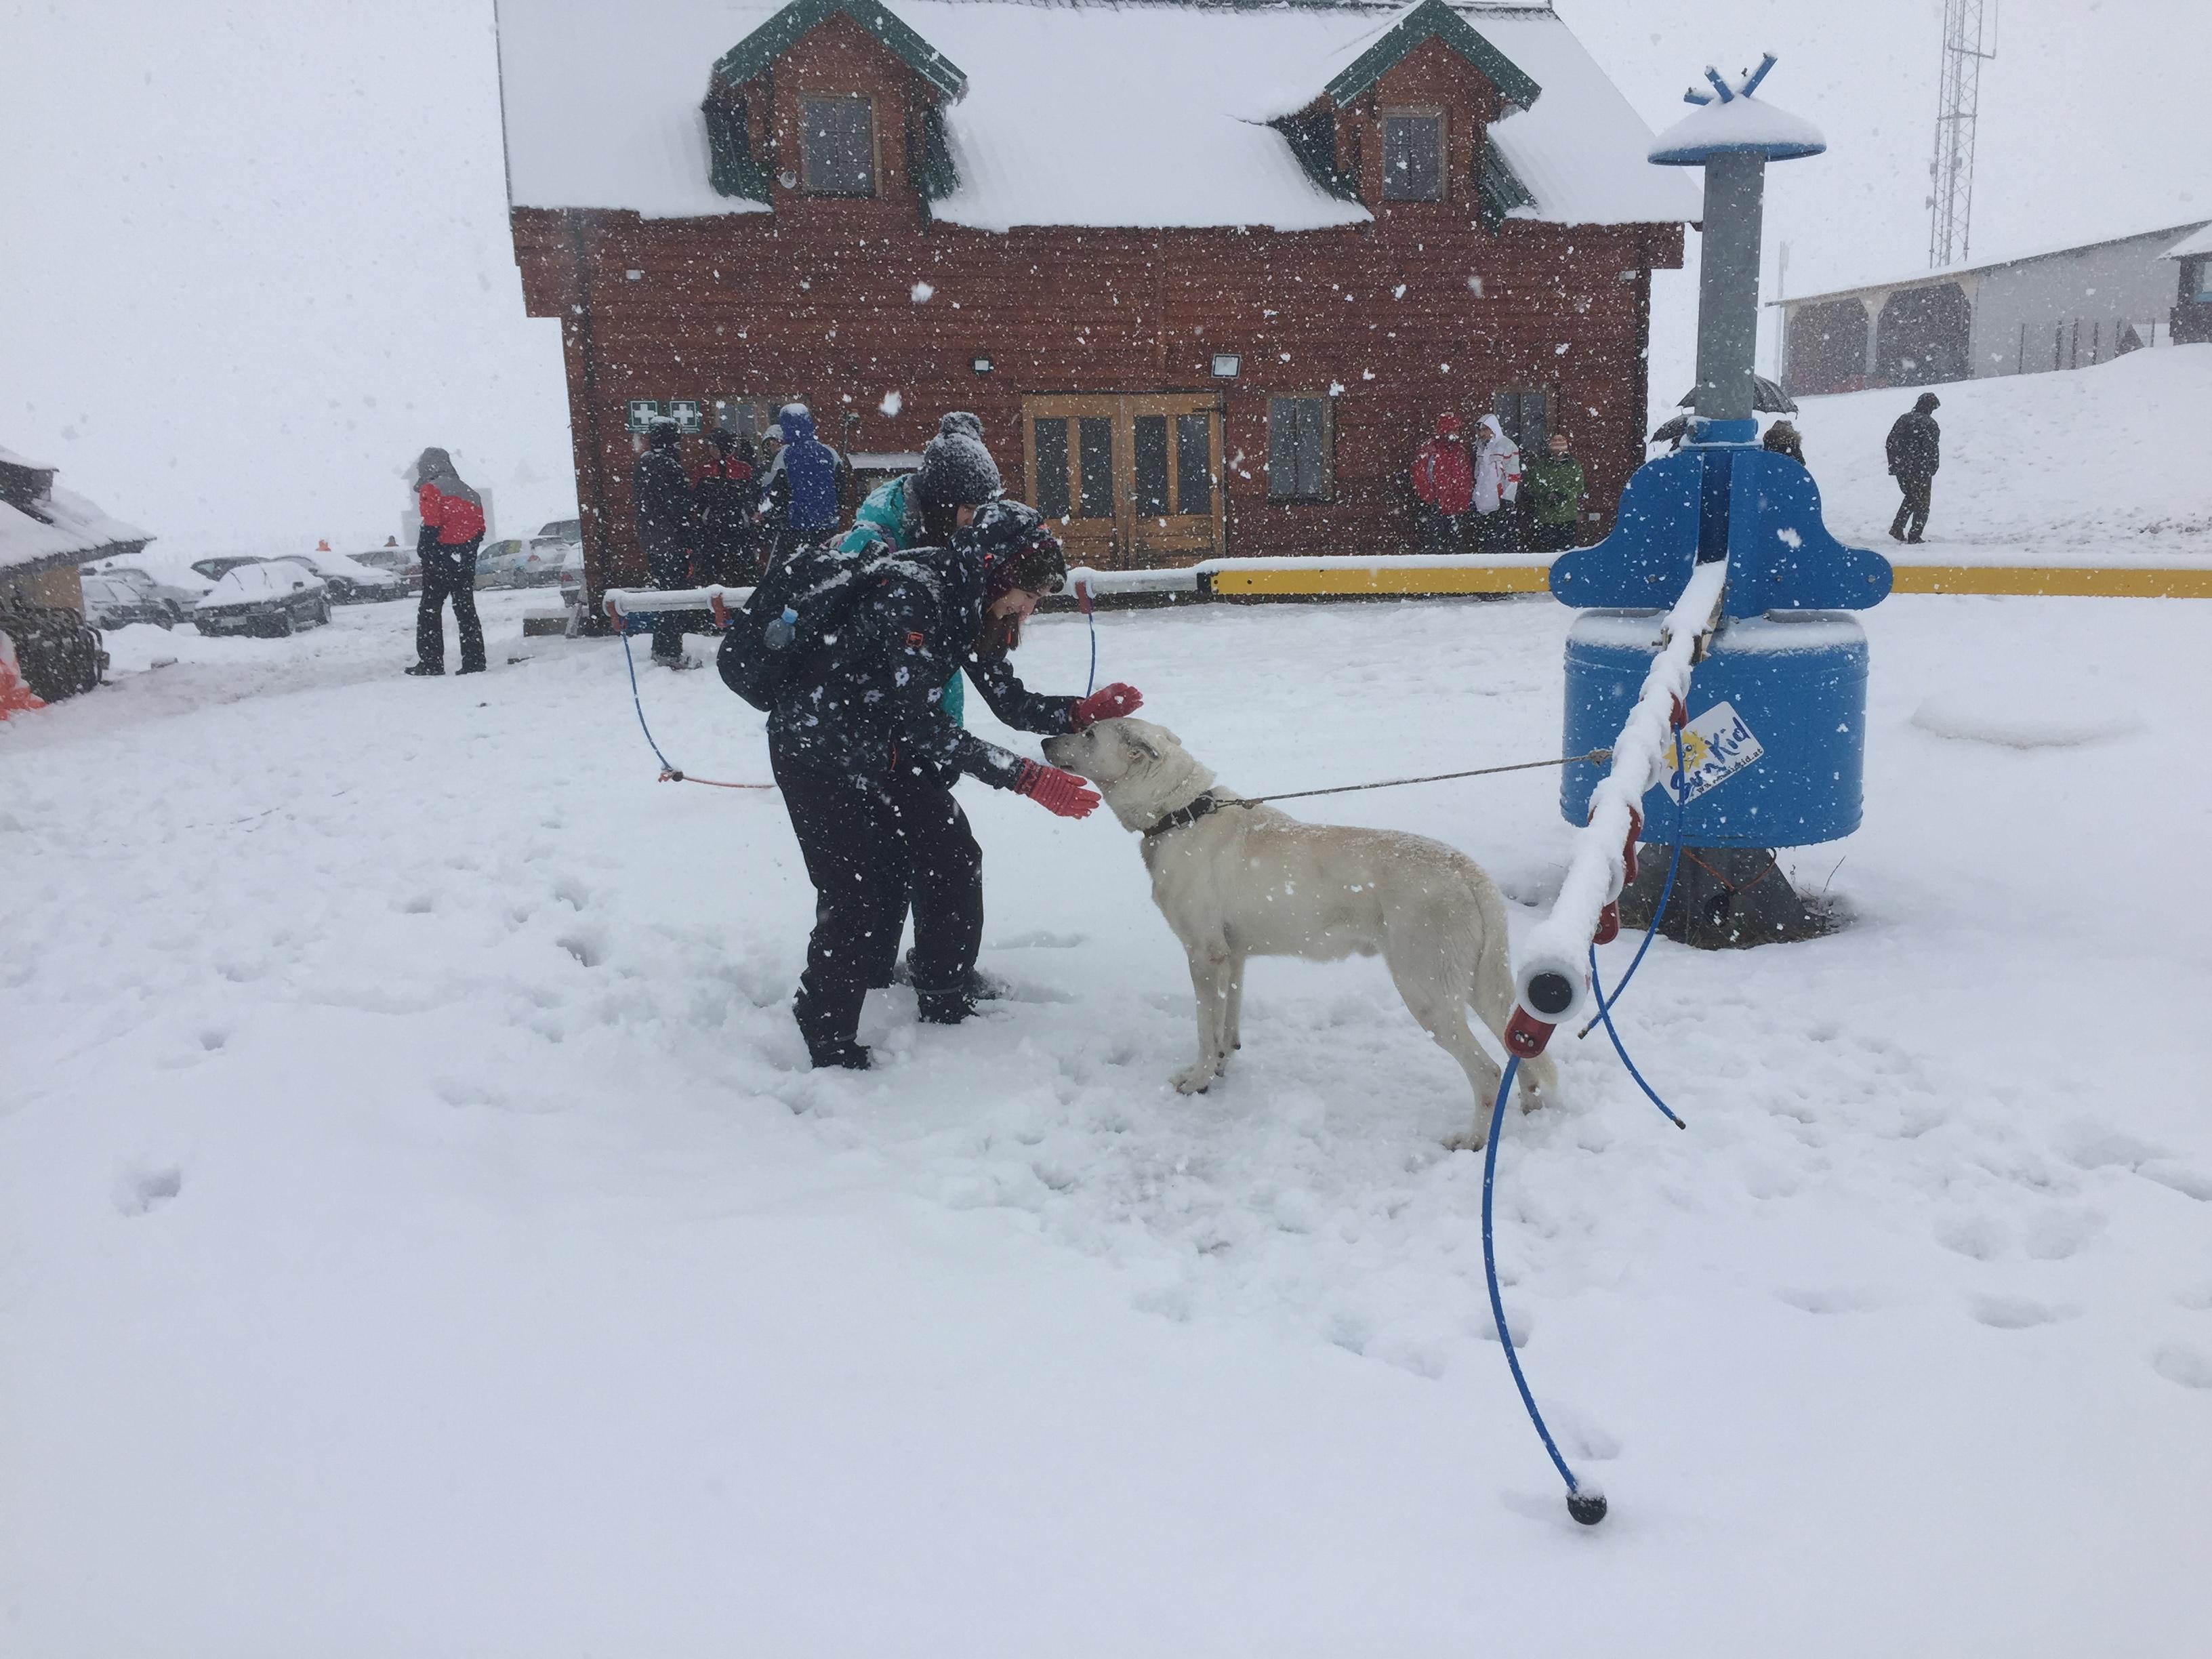 Bilo je raznih ljubitelja snijega